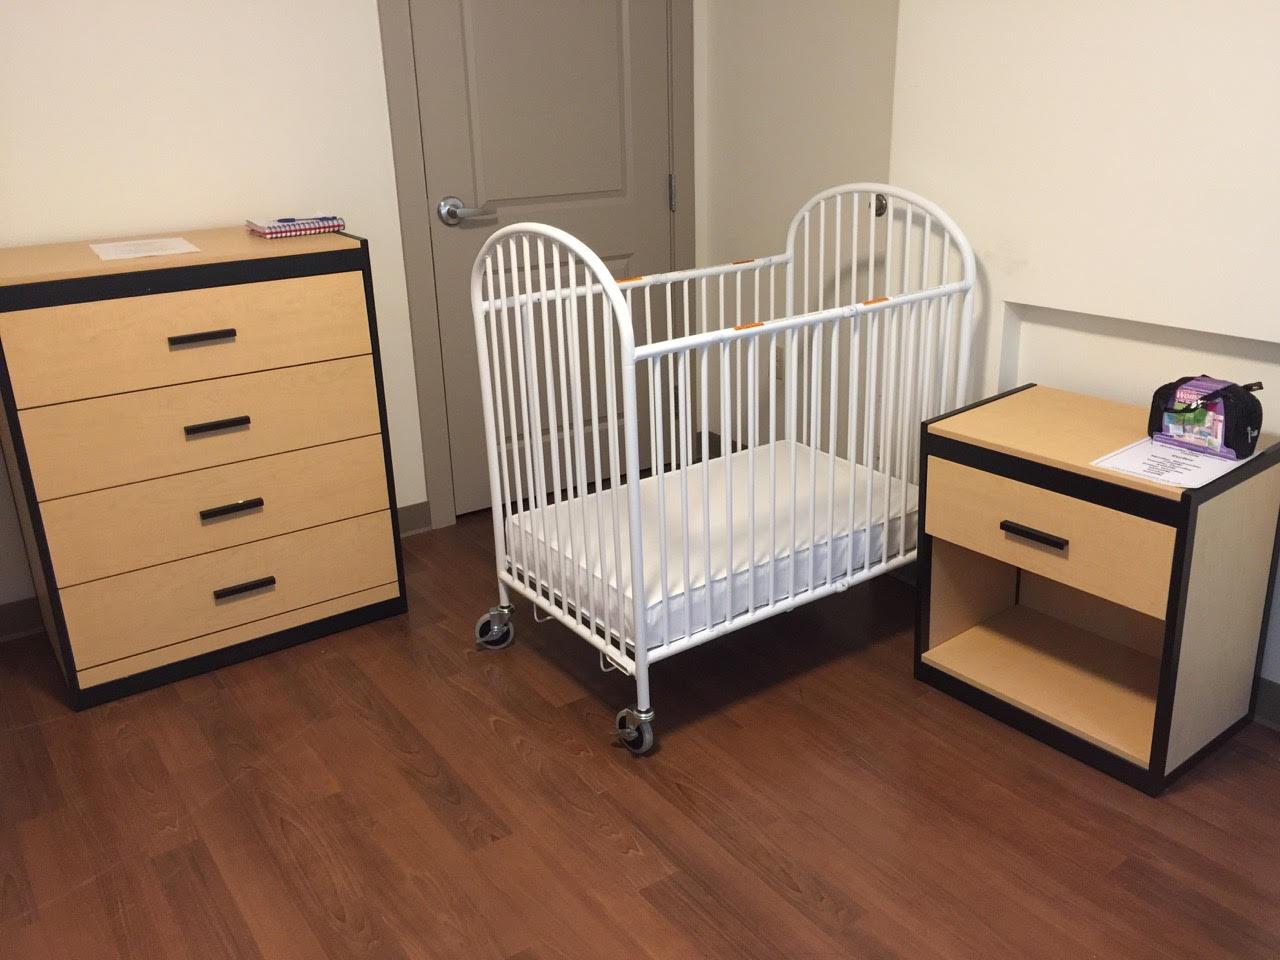 ferrante case goods, crib